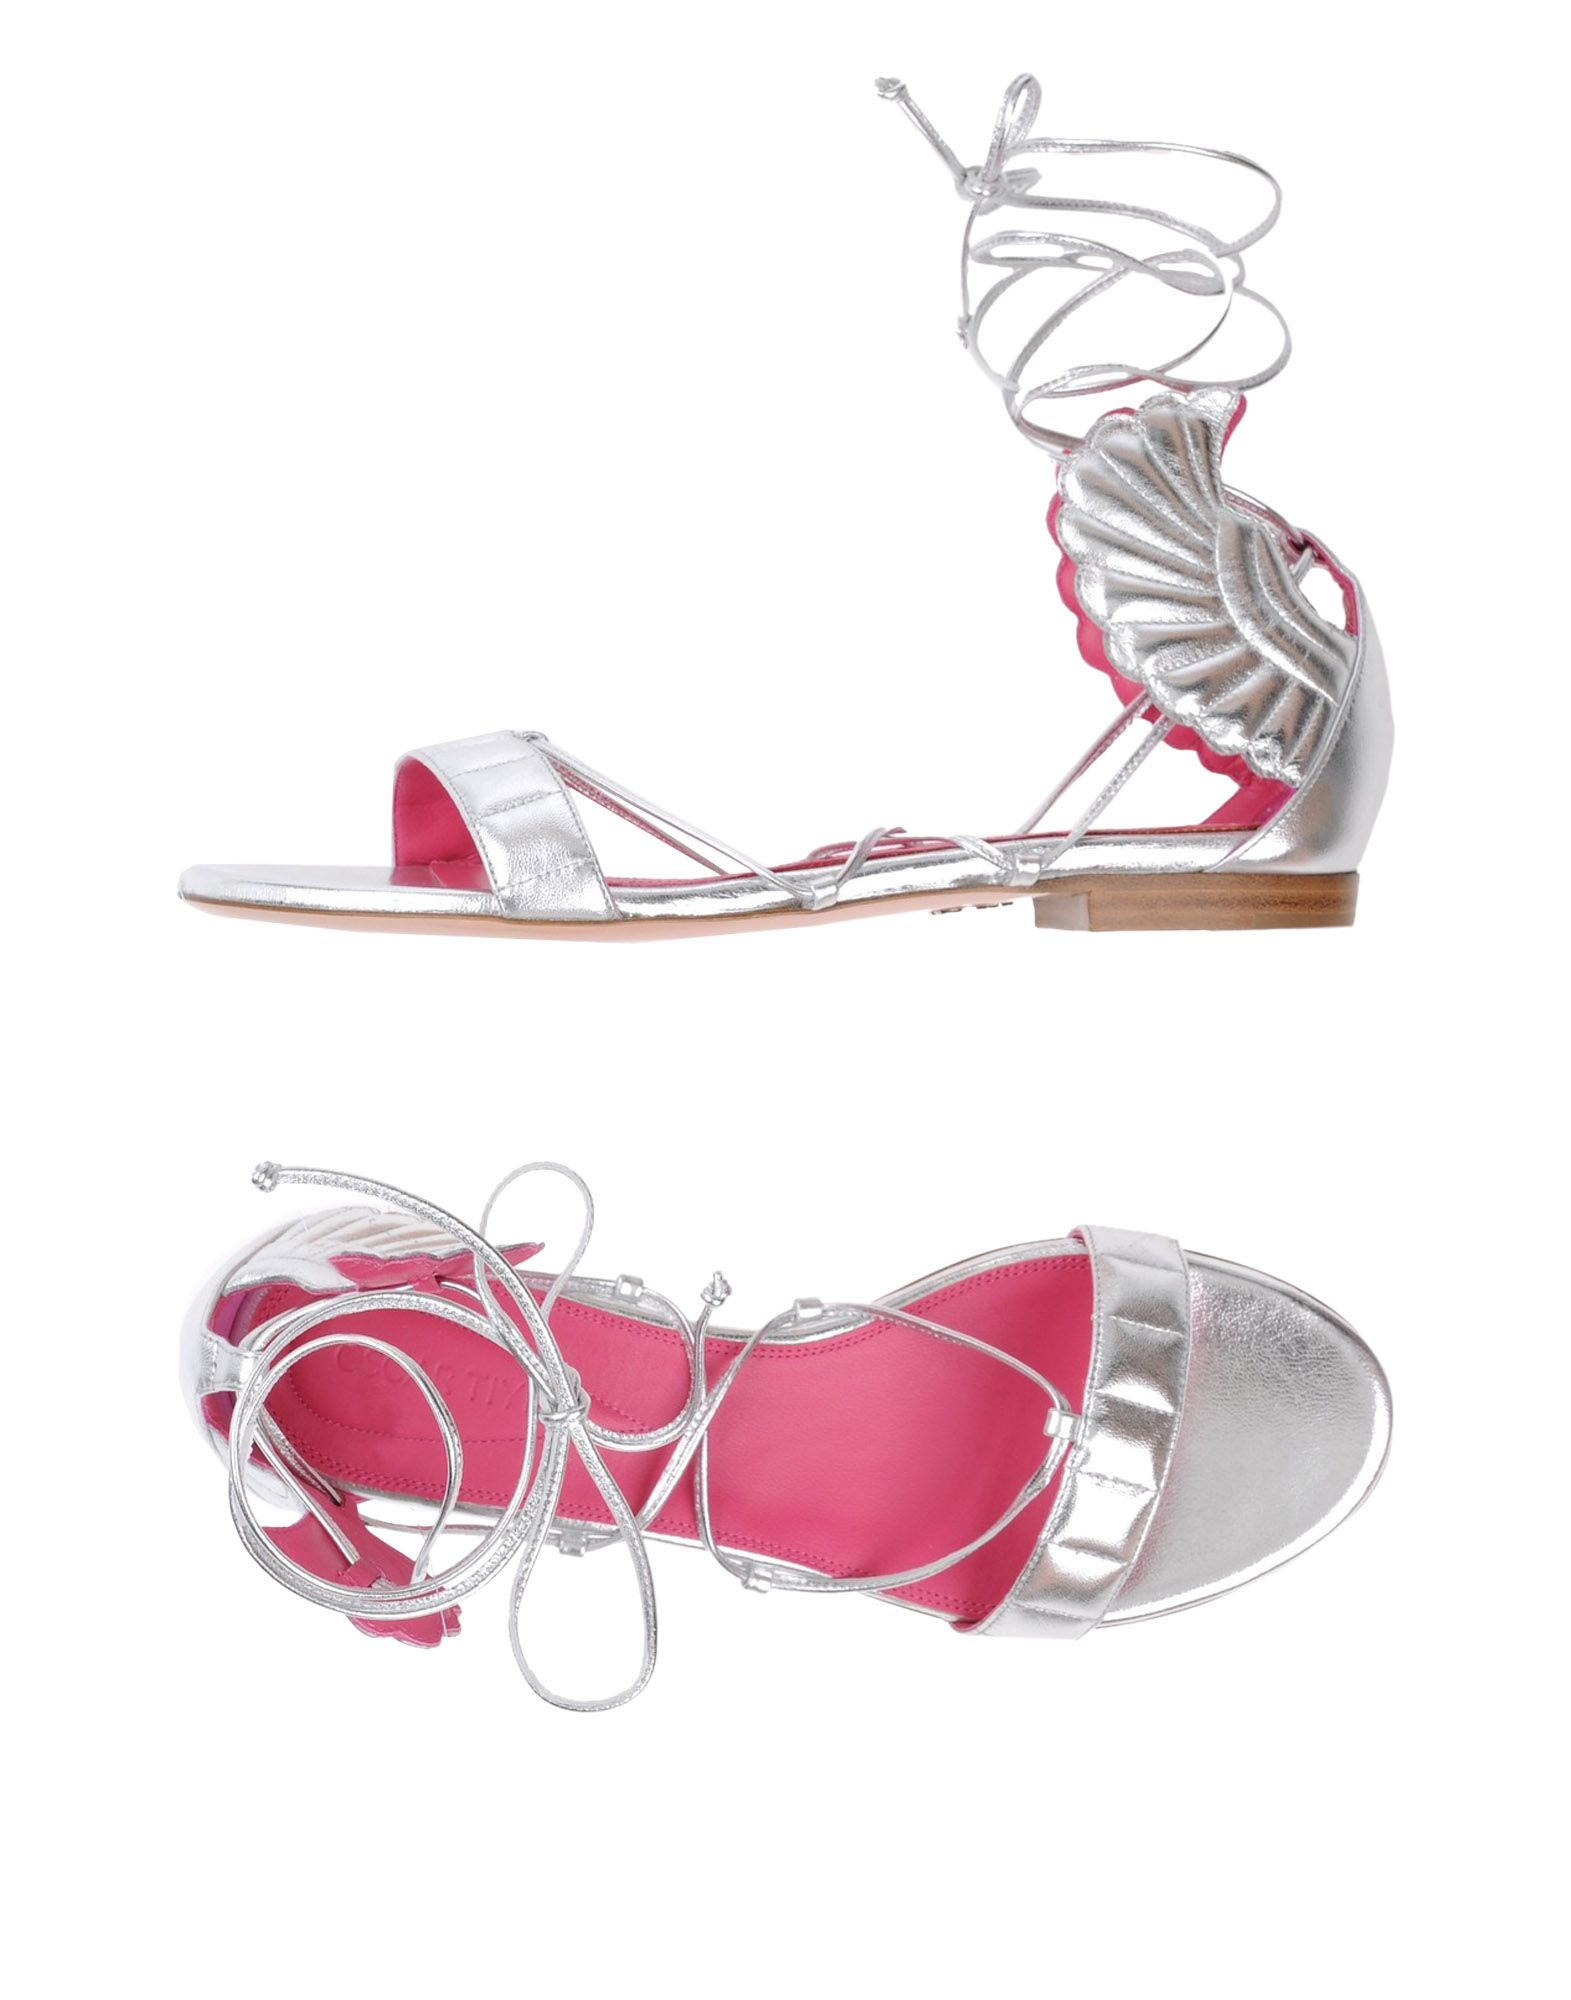 Oscar Tiye Sandalen Damen  11326786WQGut Schuhe aussehende strapazierfähige Schuhe 11326786WQGut eba9a5